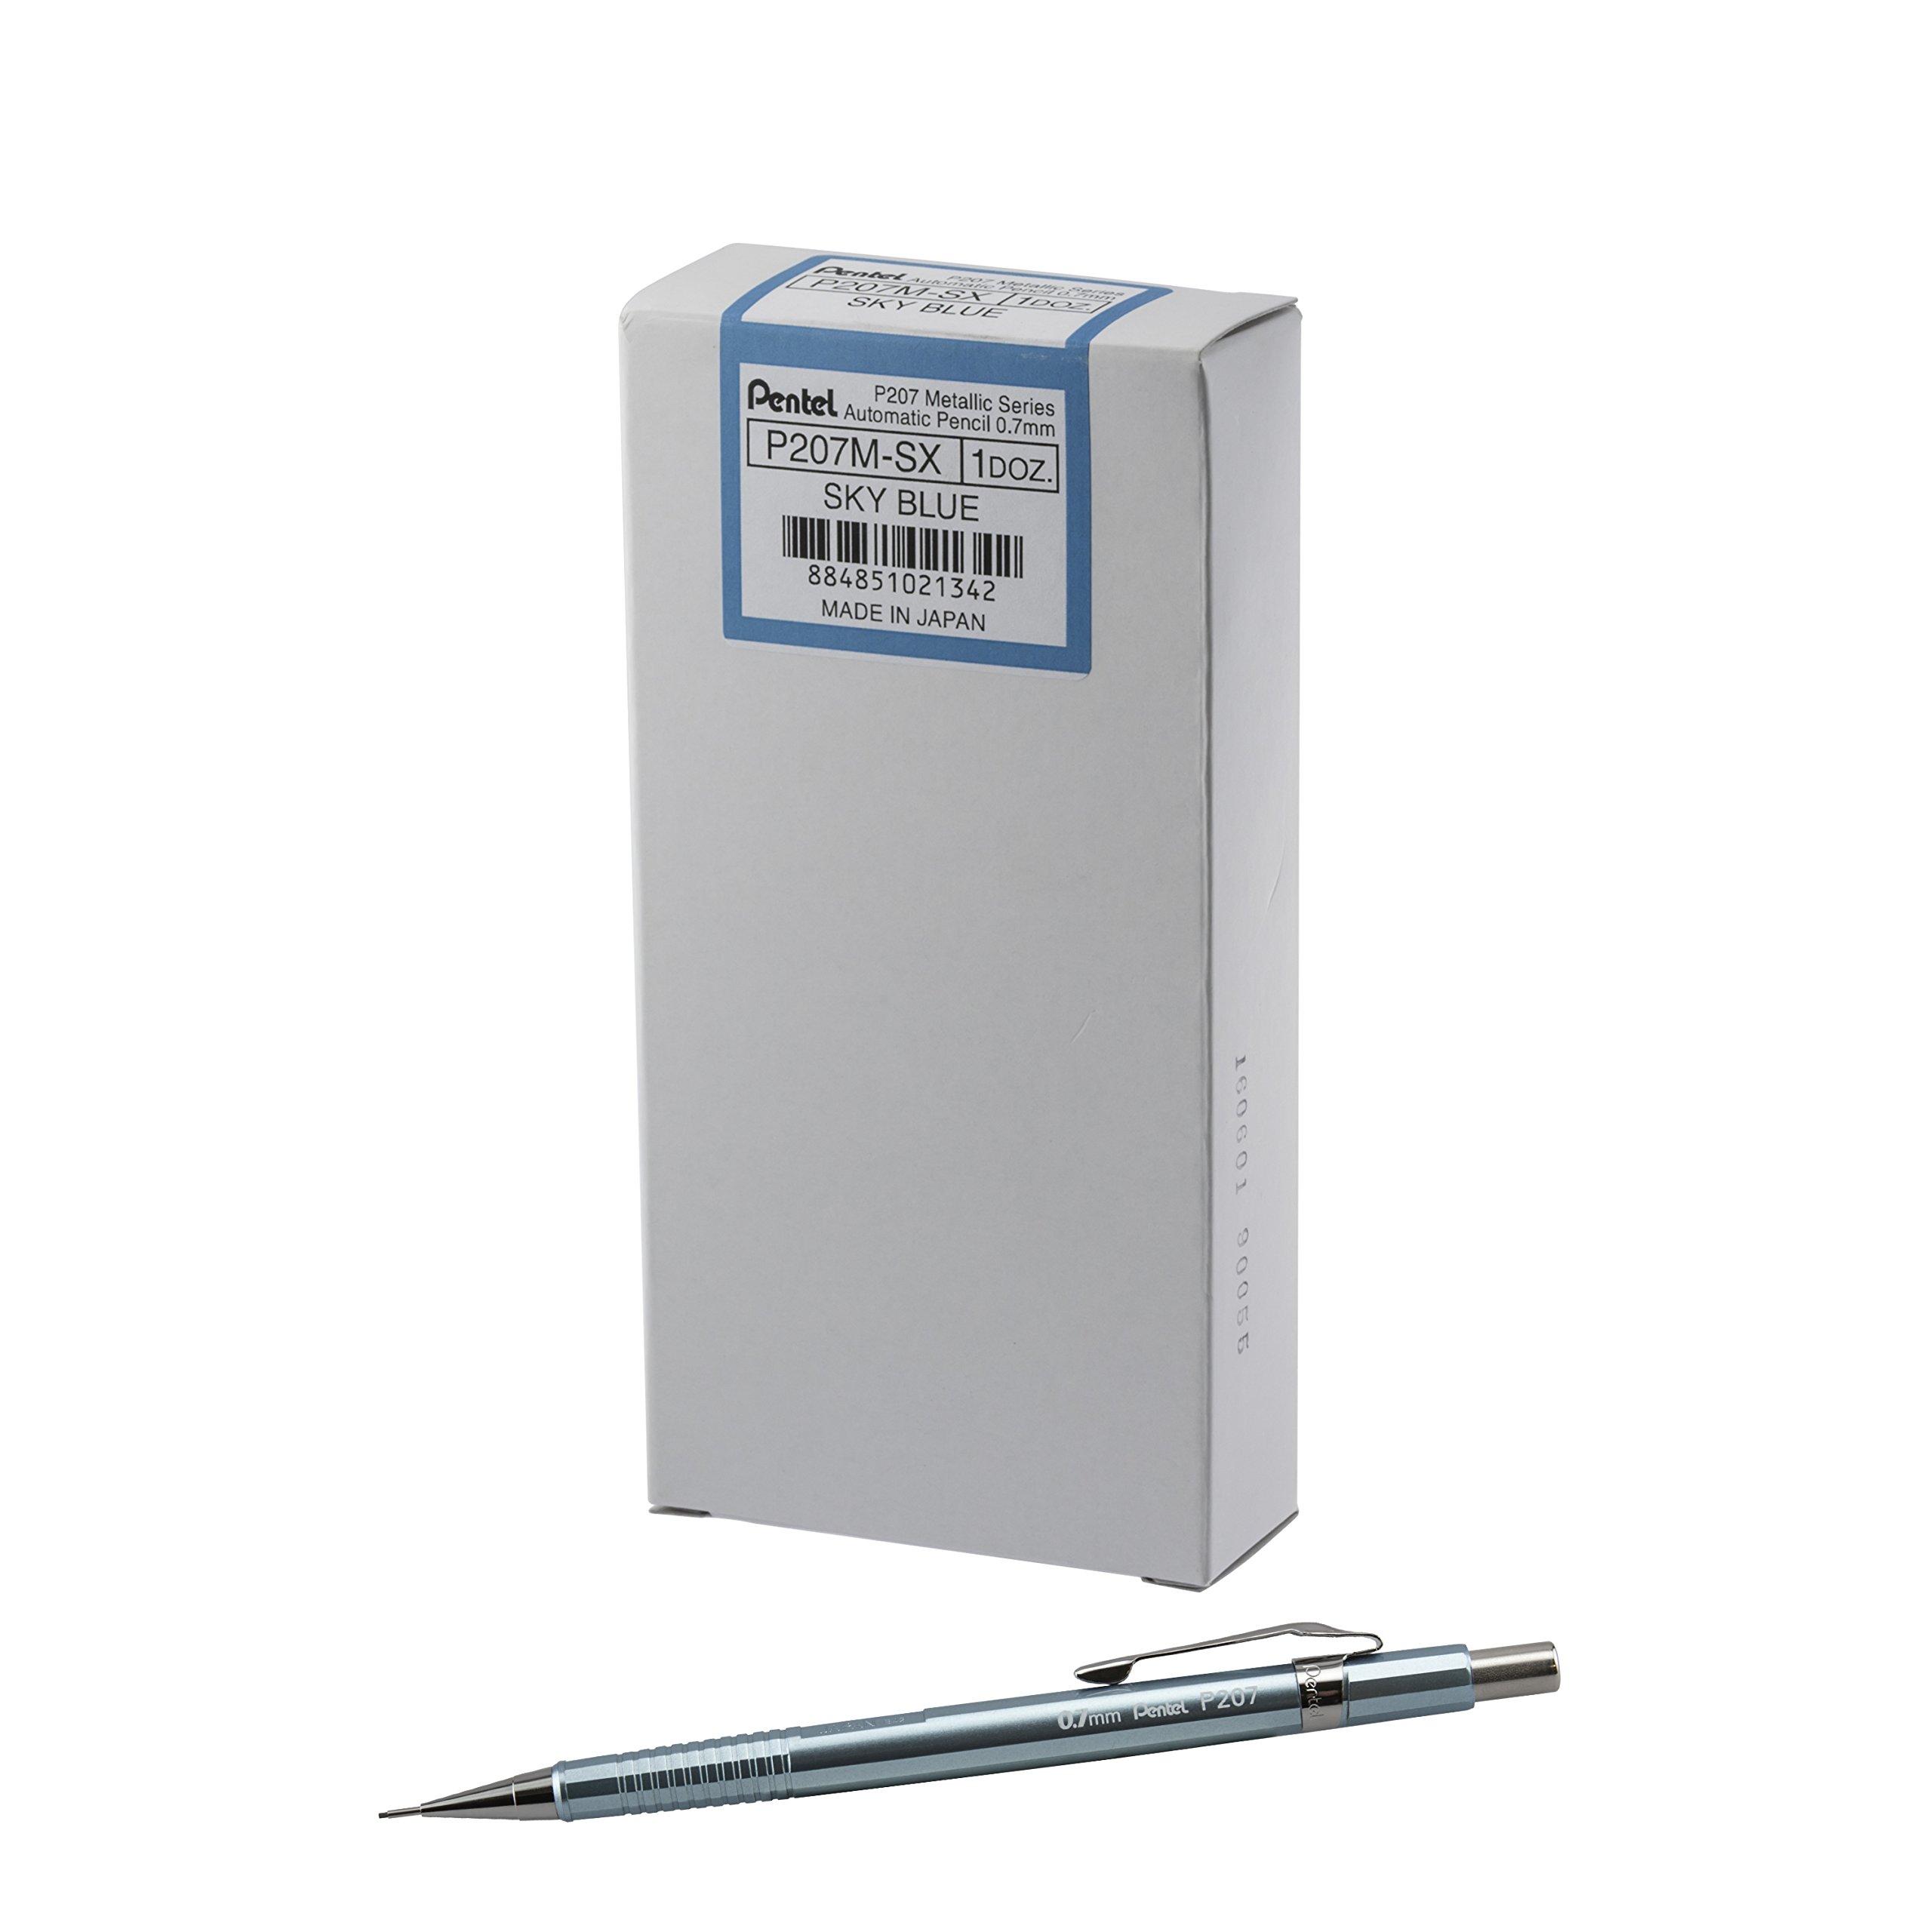 12 x Pentel Sharp portaminas, 0,5mm, barril negro